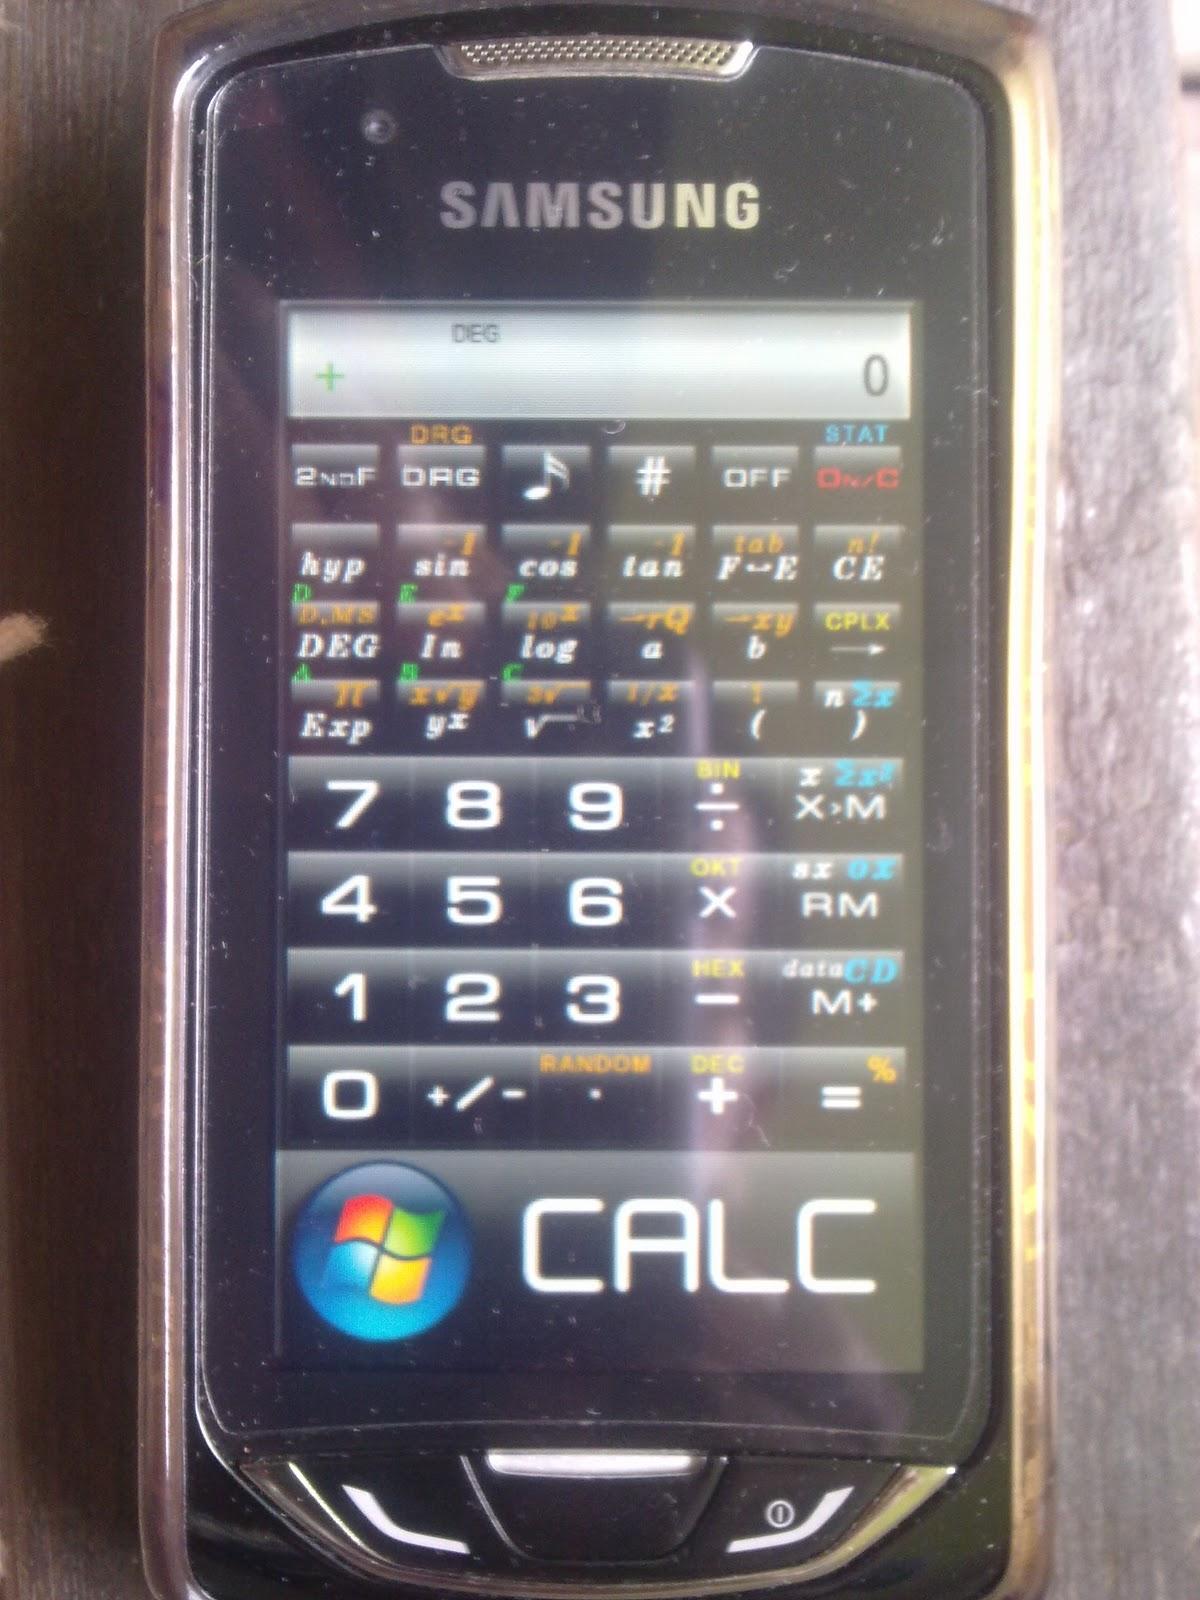 http://2.bp.blogspot.com/_FP66P-sJZq4/TM-xVHOKzBI/AAAAAAAAAlA/lzemq7K5GBM/s1600/Calculator%2Bon%2BMonte.jpg